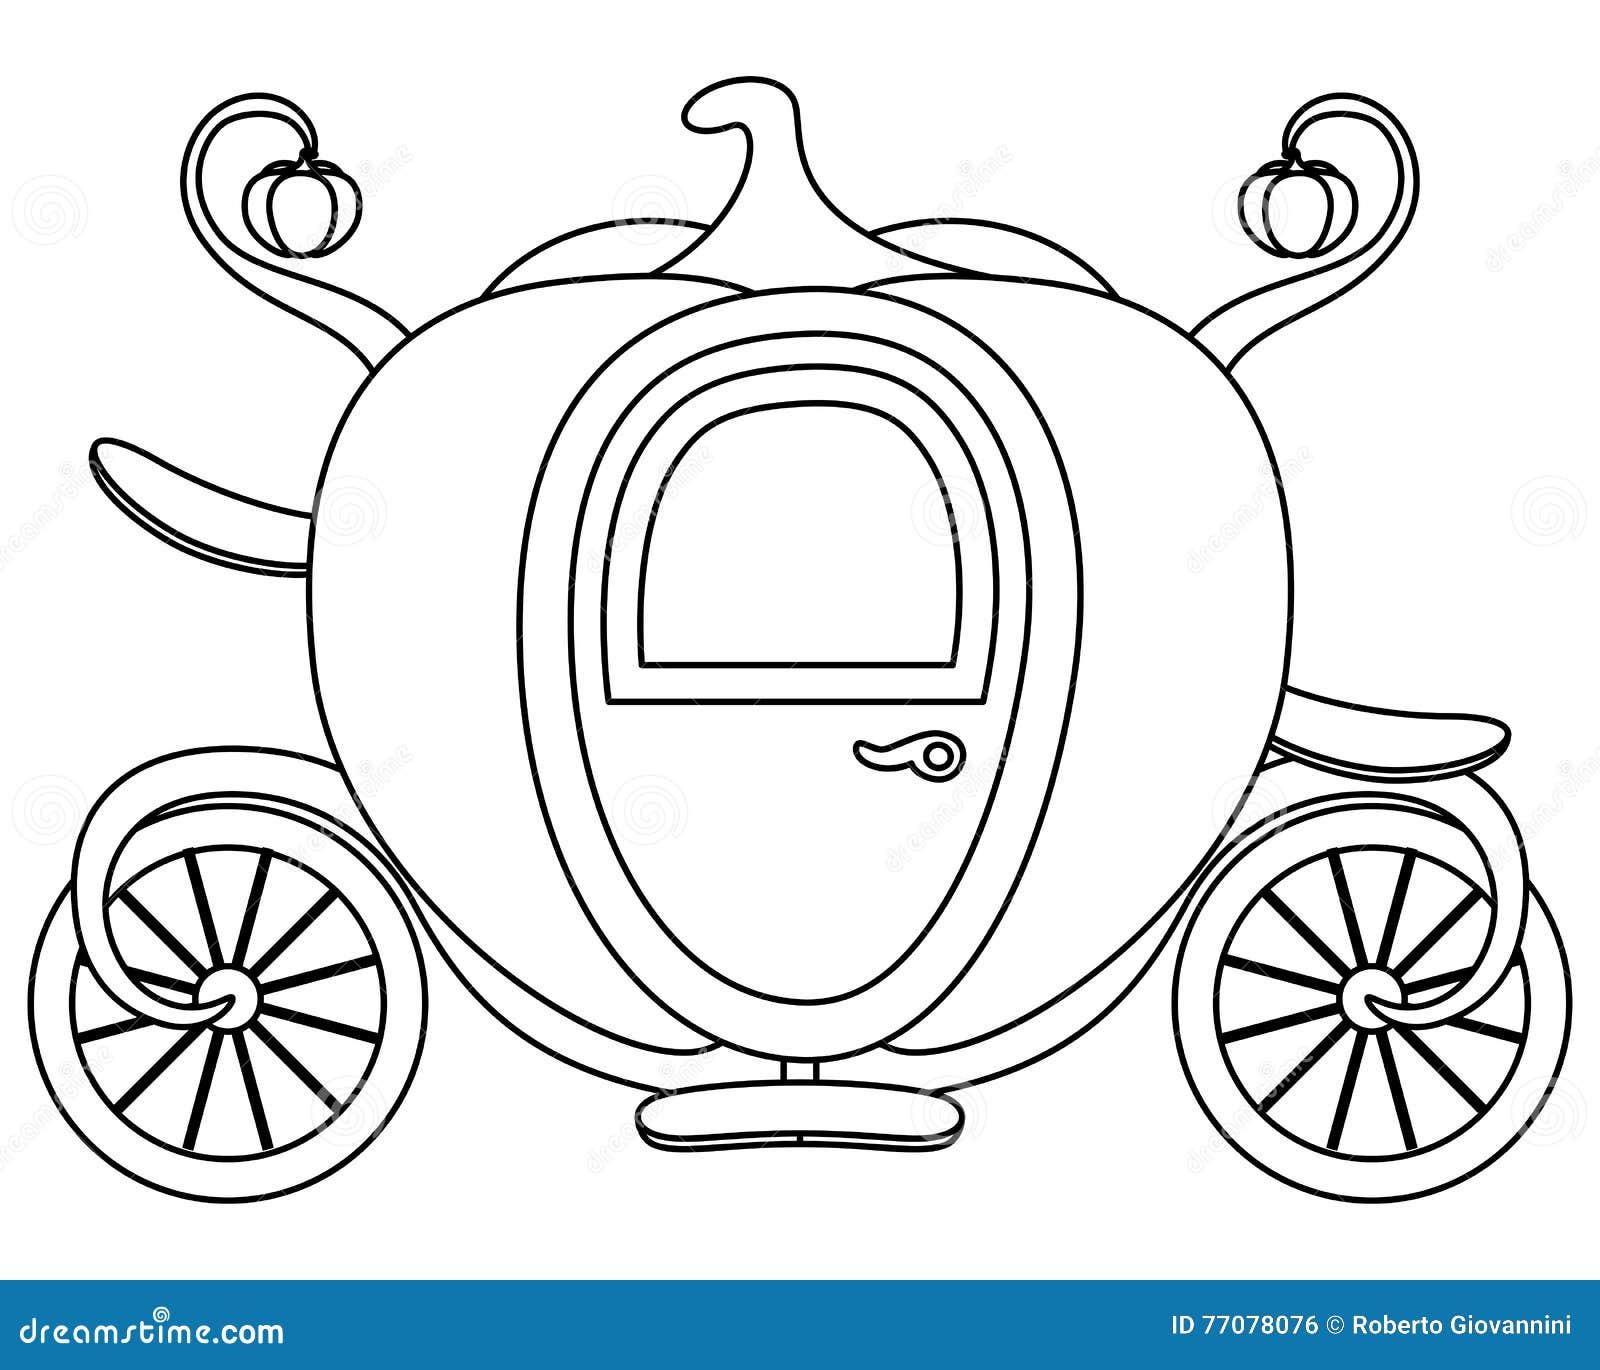 santa horse buggy coloring pages - photo#27